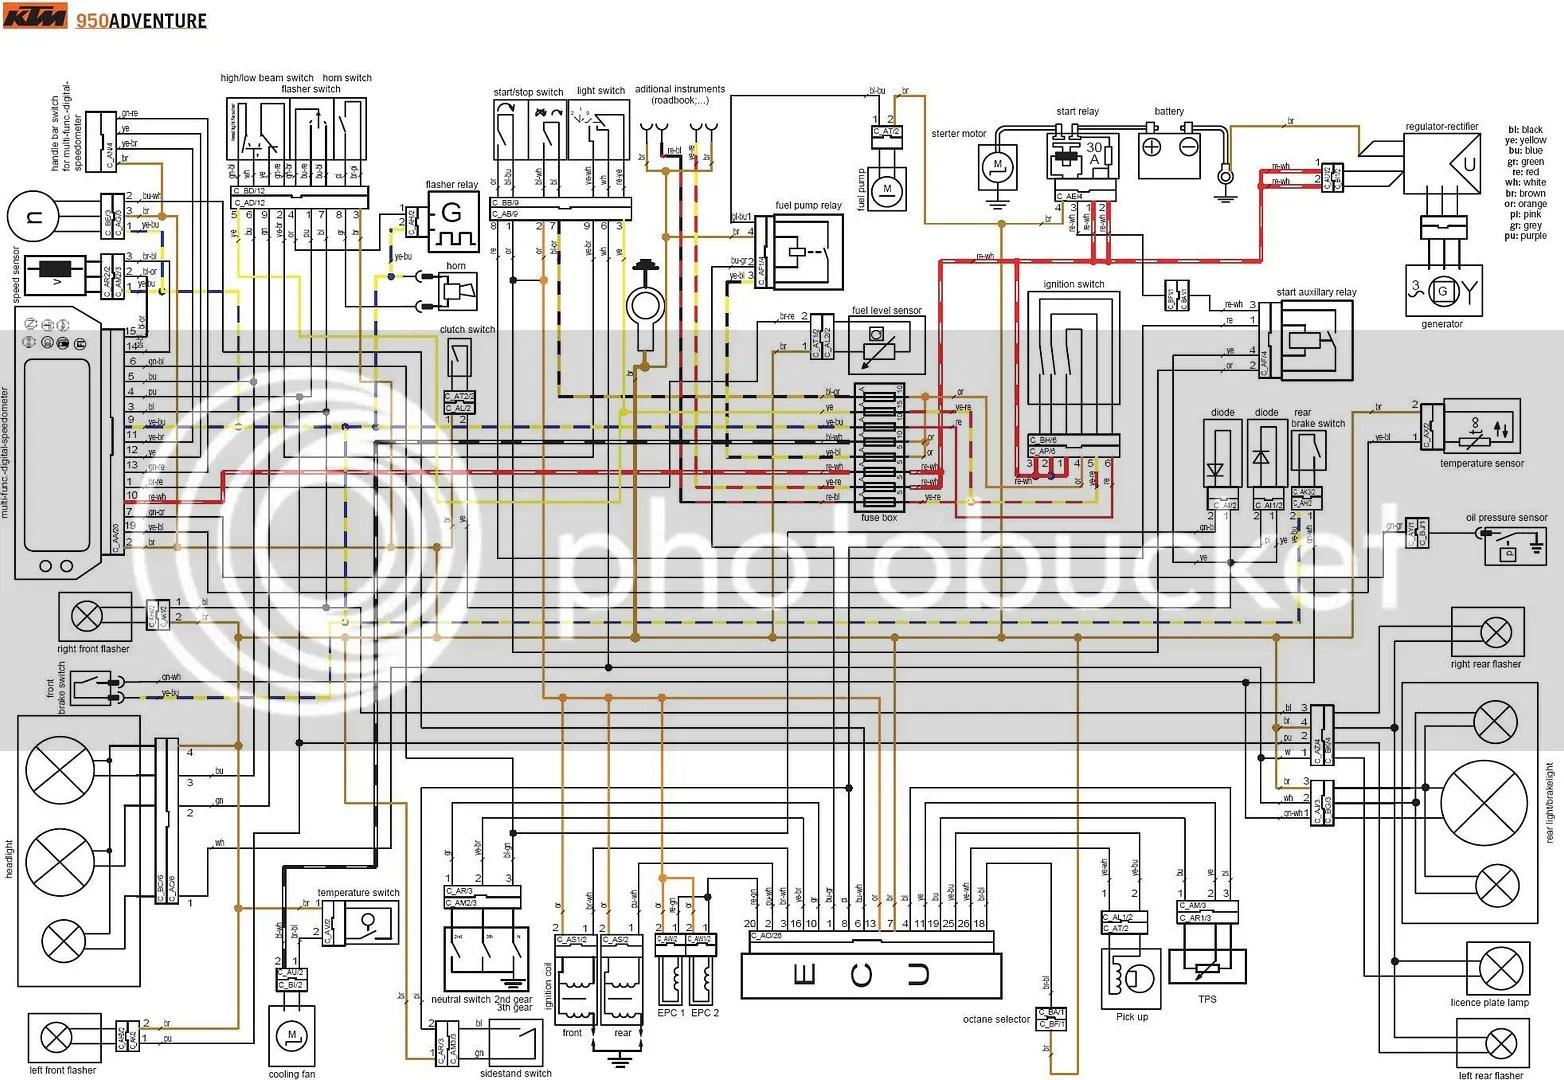 G 06 Ktm Exc Wiring Diagram Diagrams Hubs Polaris Sportsman 500 Ignition Explorer